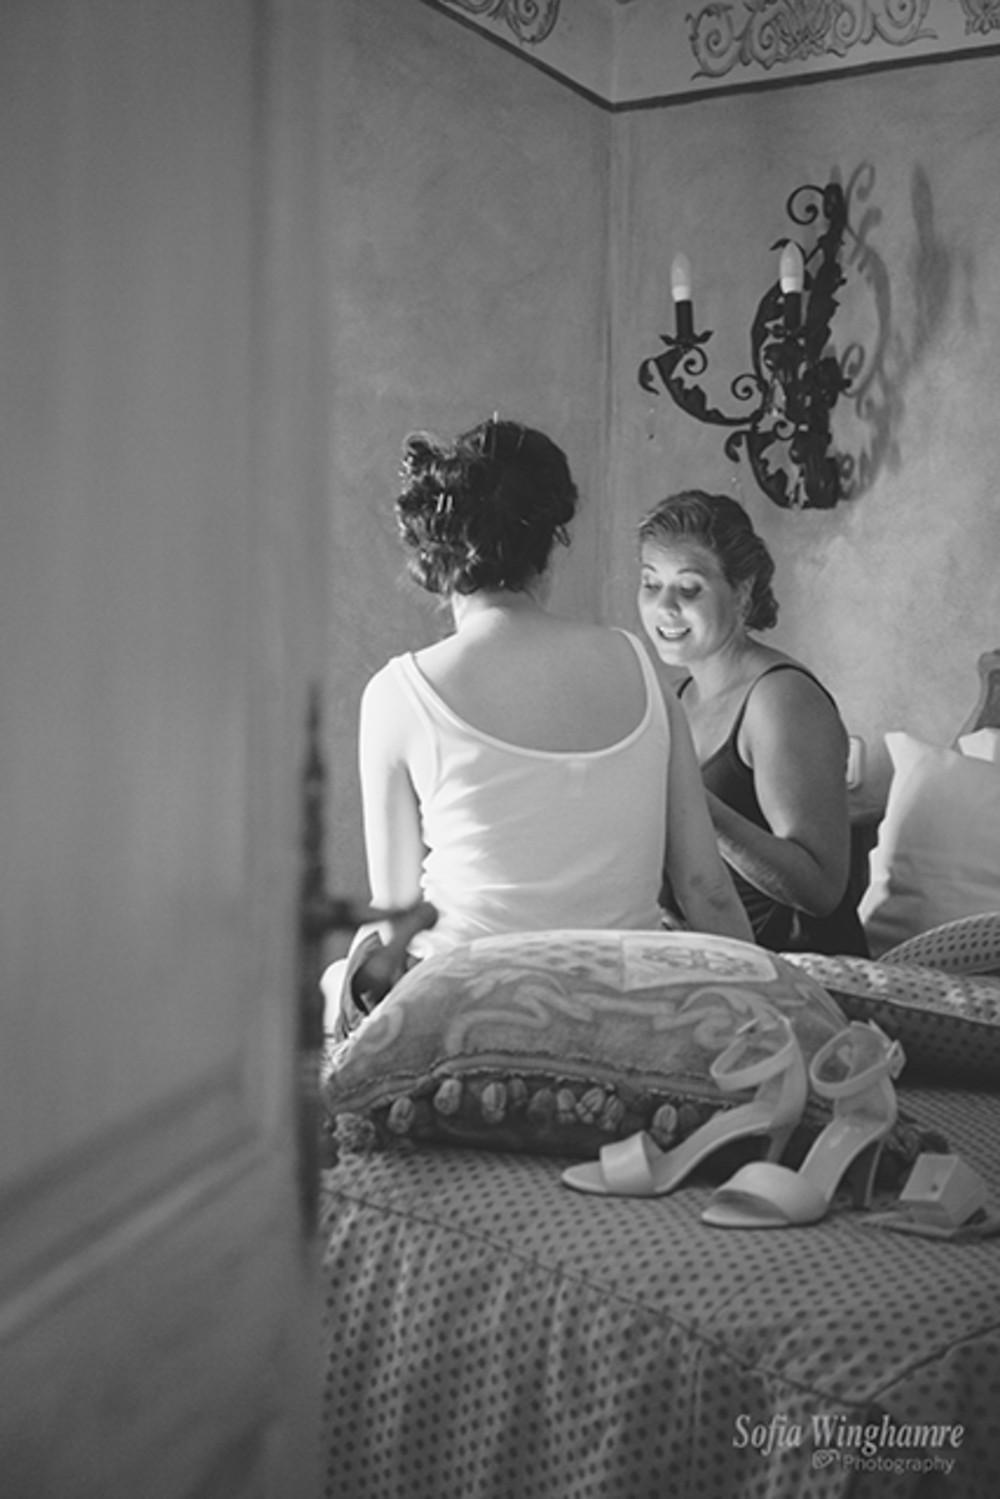 The bridesmaids preparing their songs